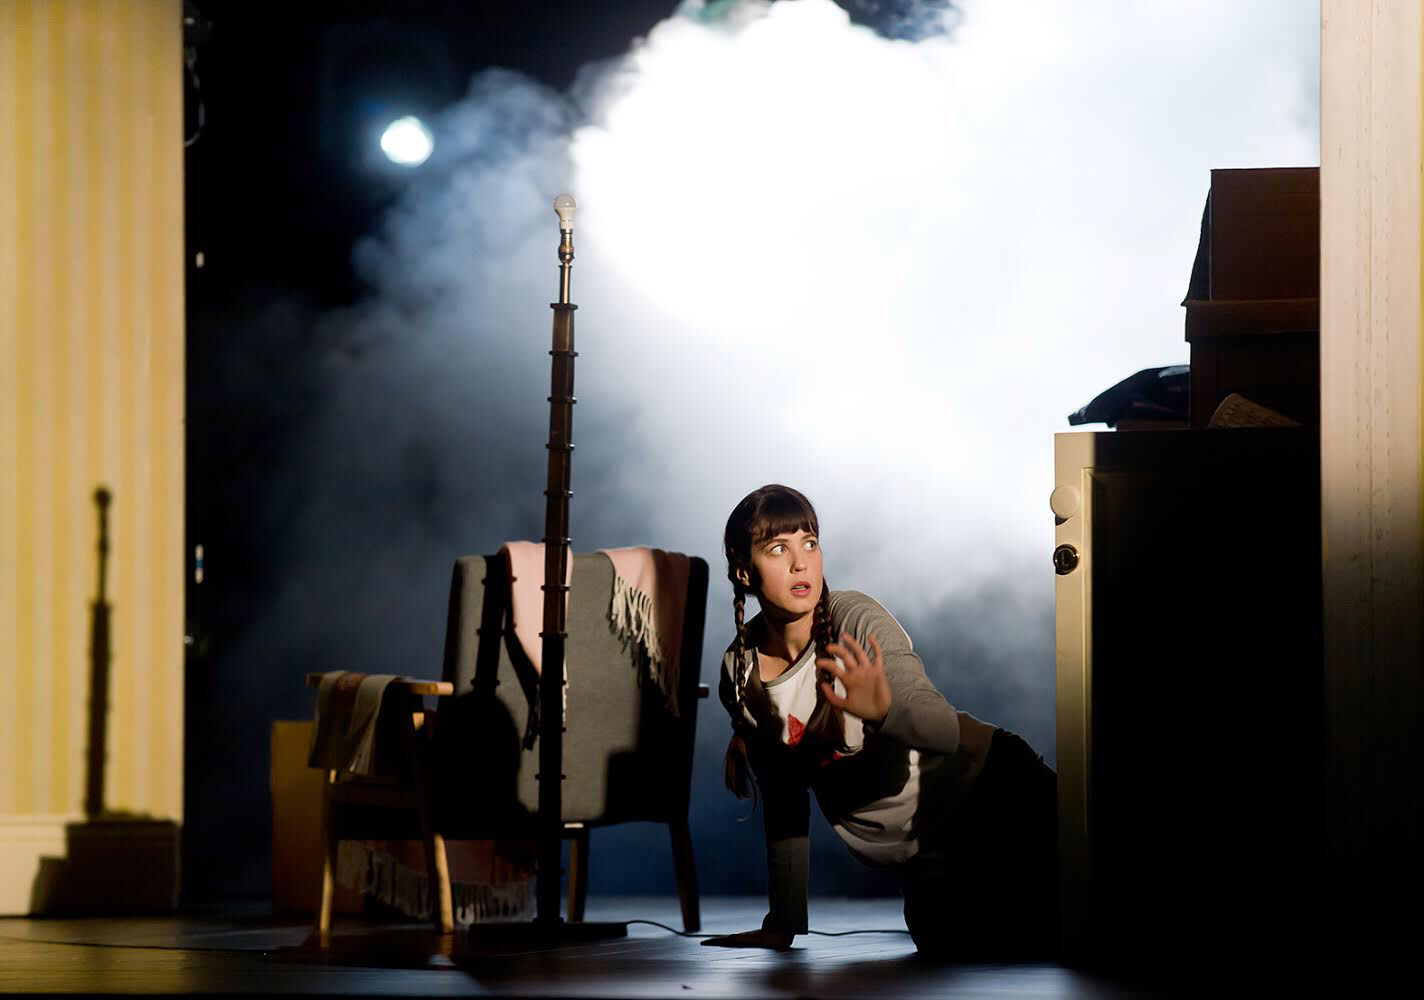 Coraline - Coraline - Opéra de Lille 2018 - Photo: Frédéric Iovino